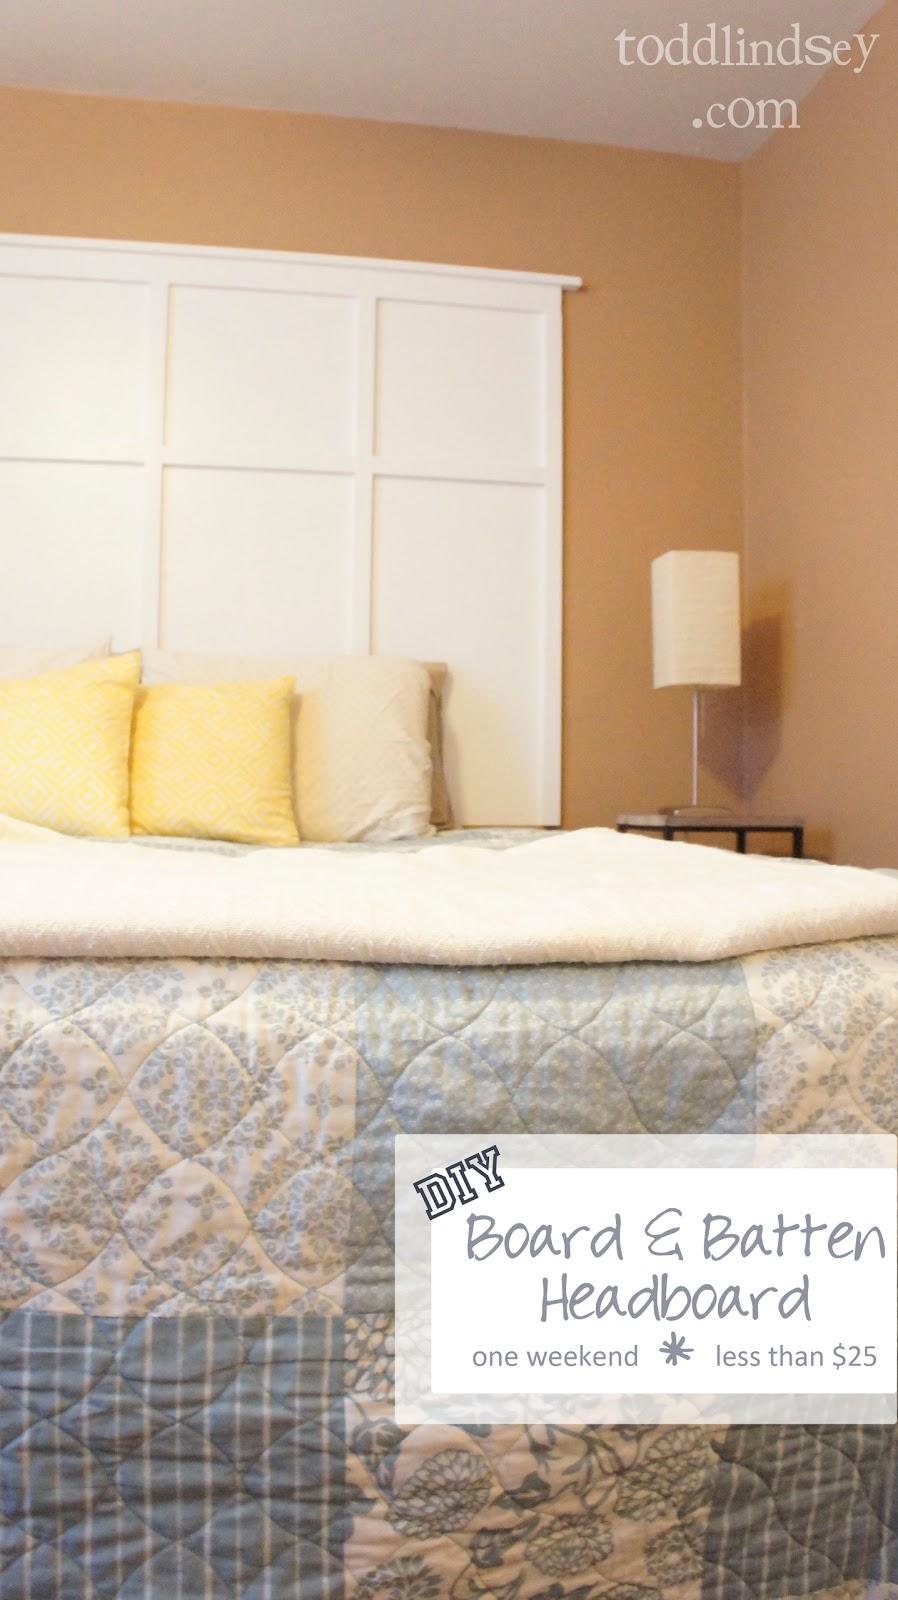 Domer Home: DIY Board & Batten Headboard